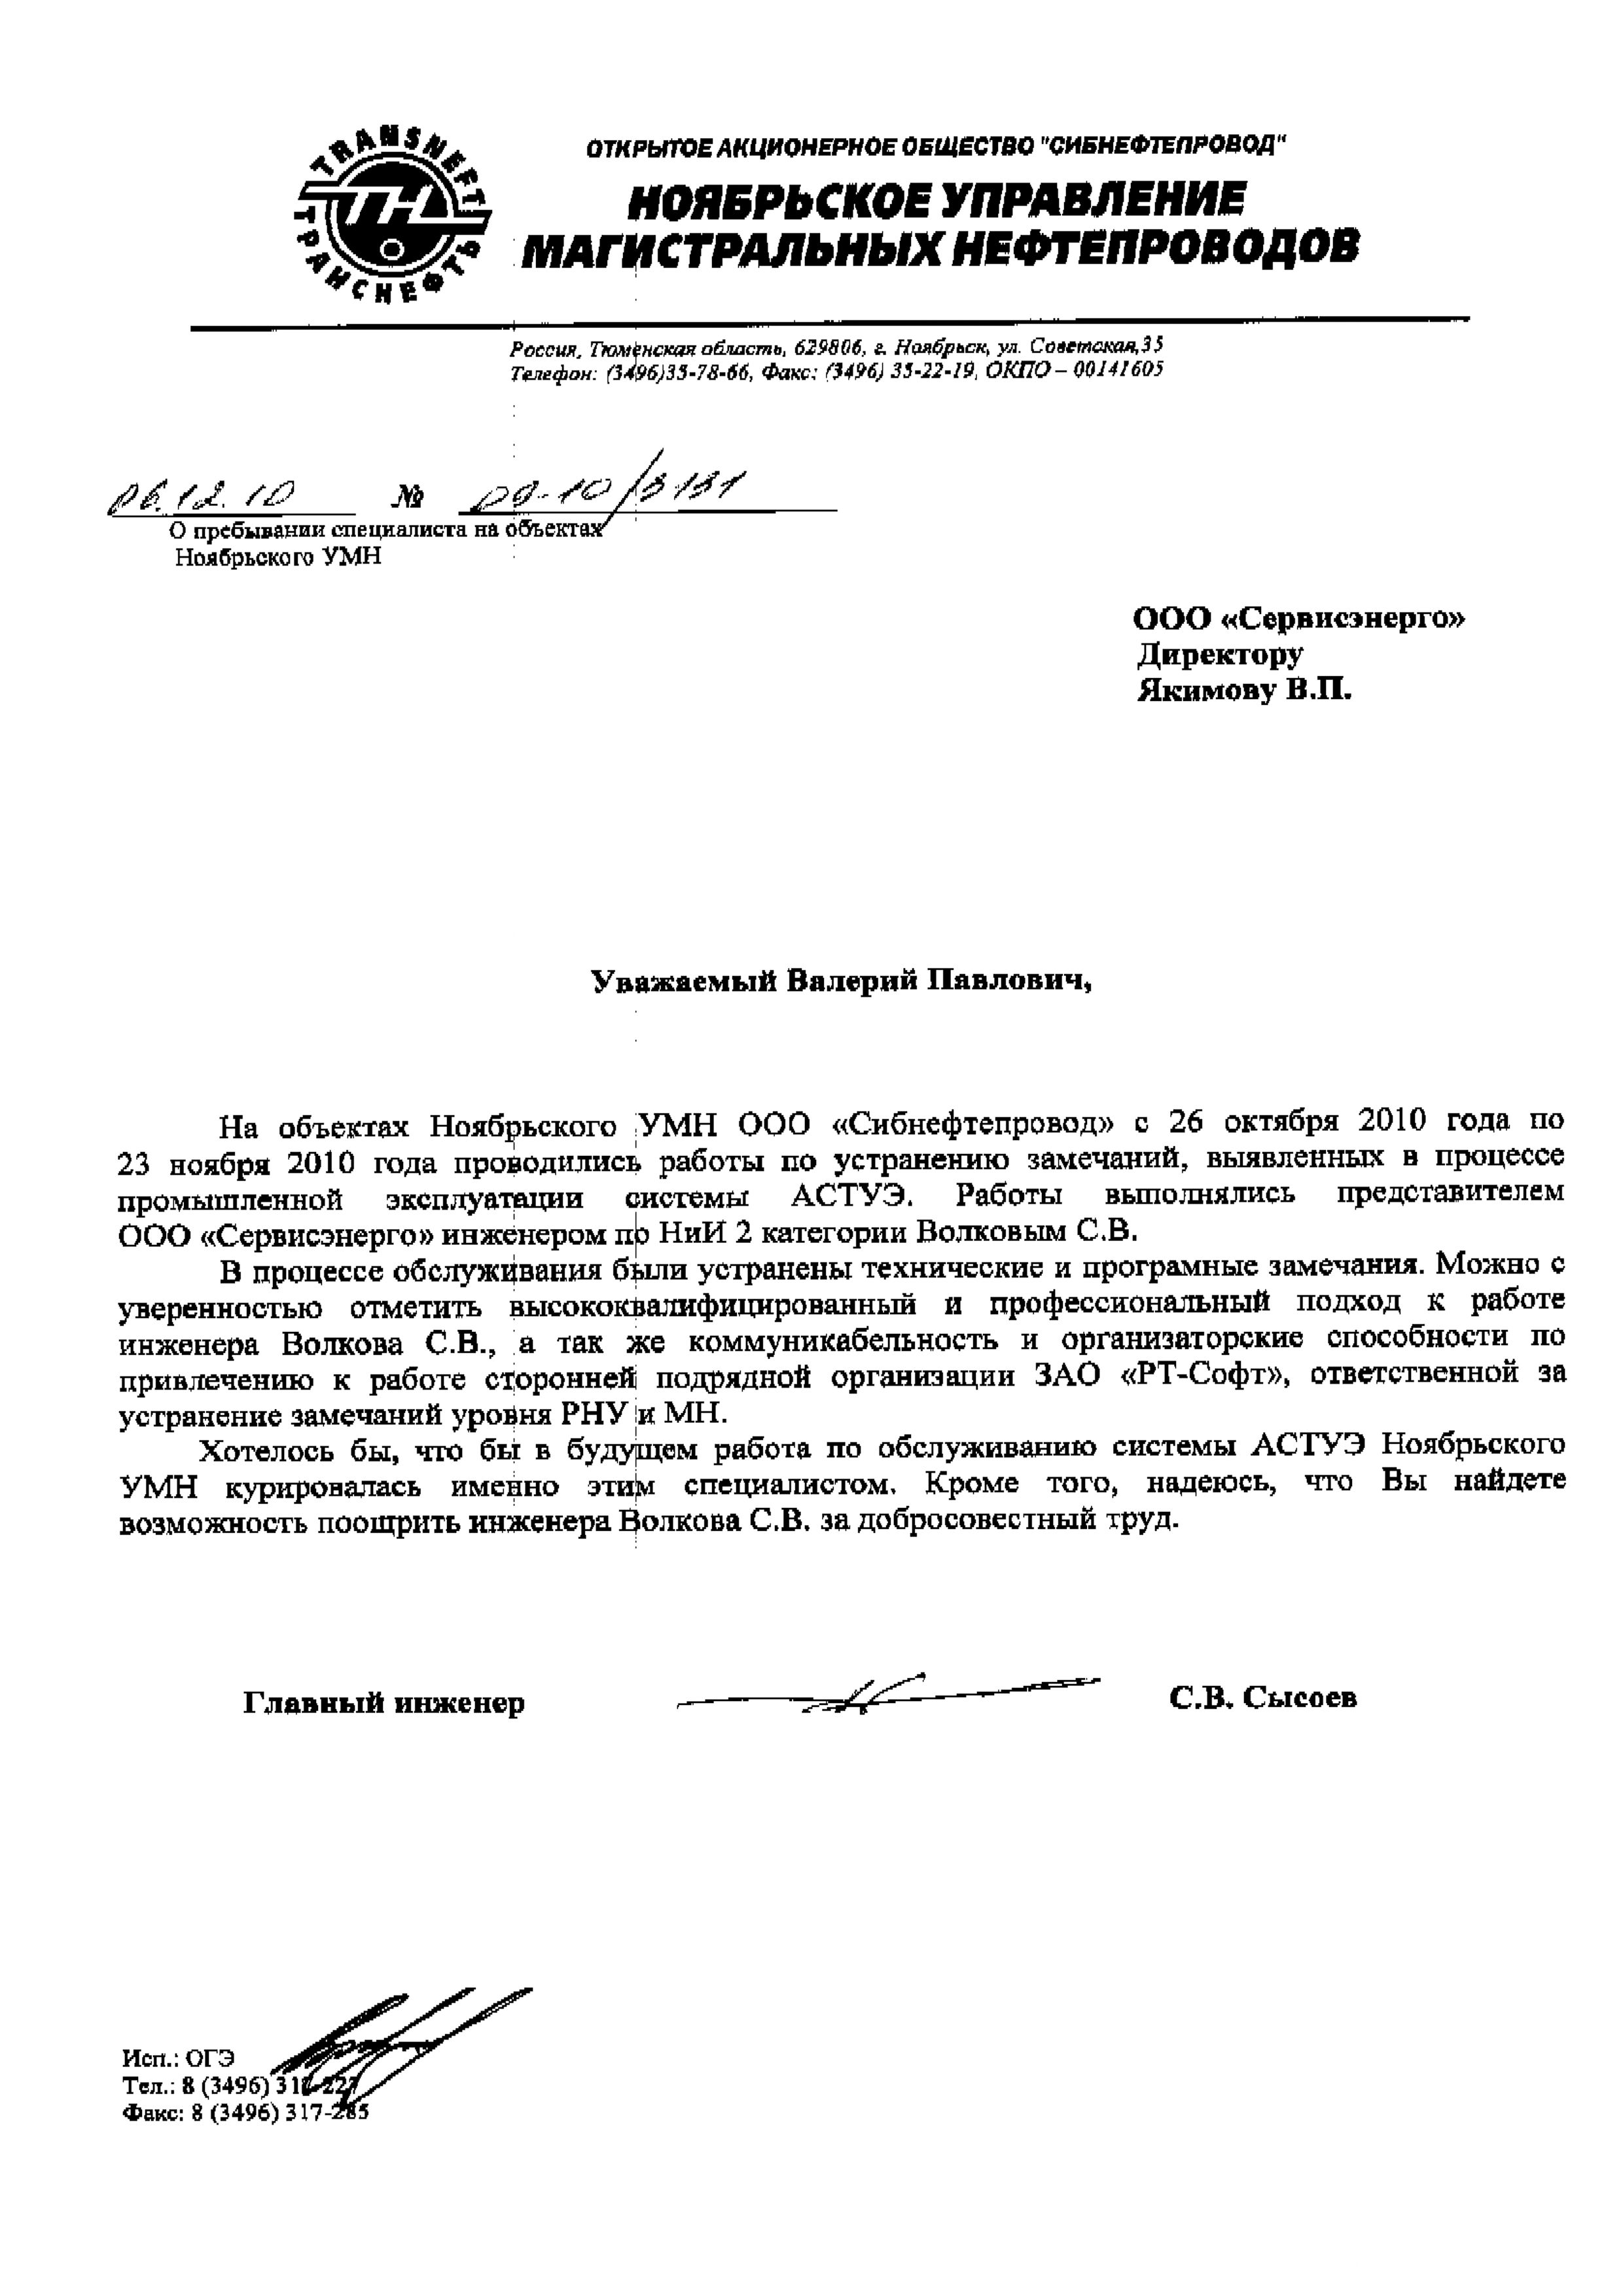 отзыв_2010_Сибнефтепровод (СЕРВИСЭНЕРГО)